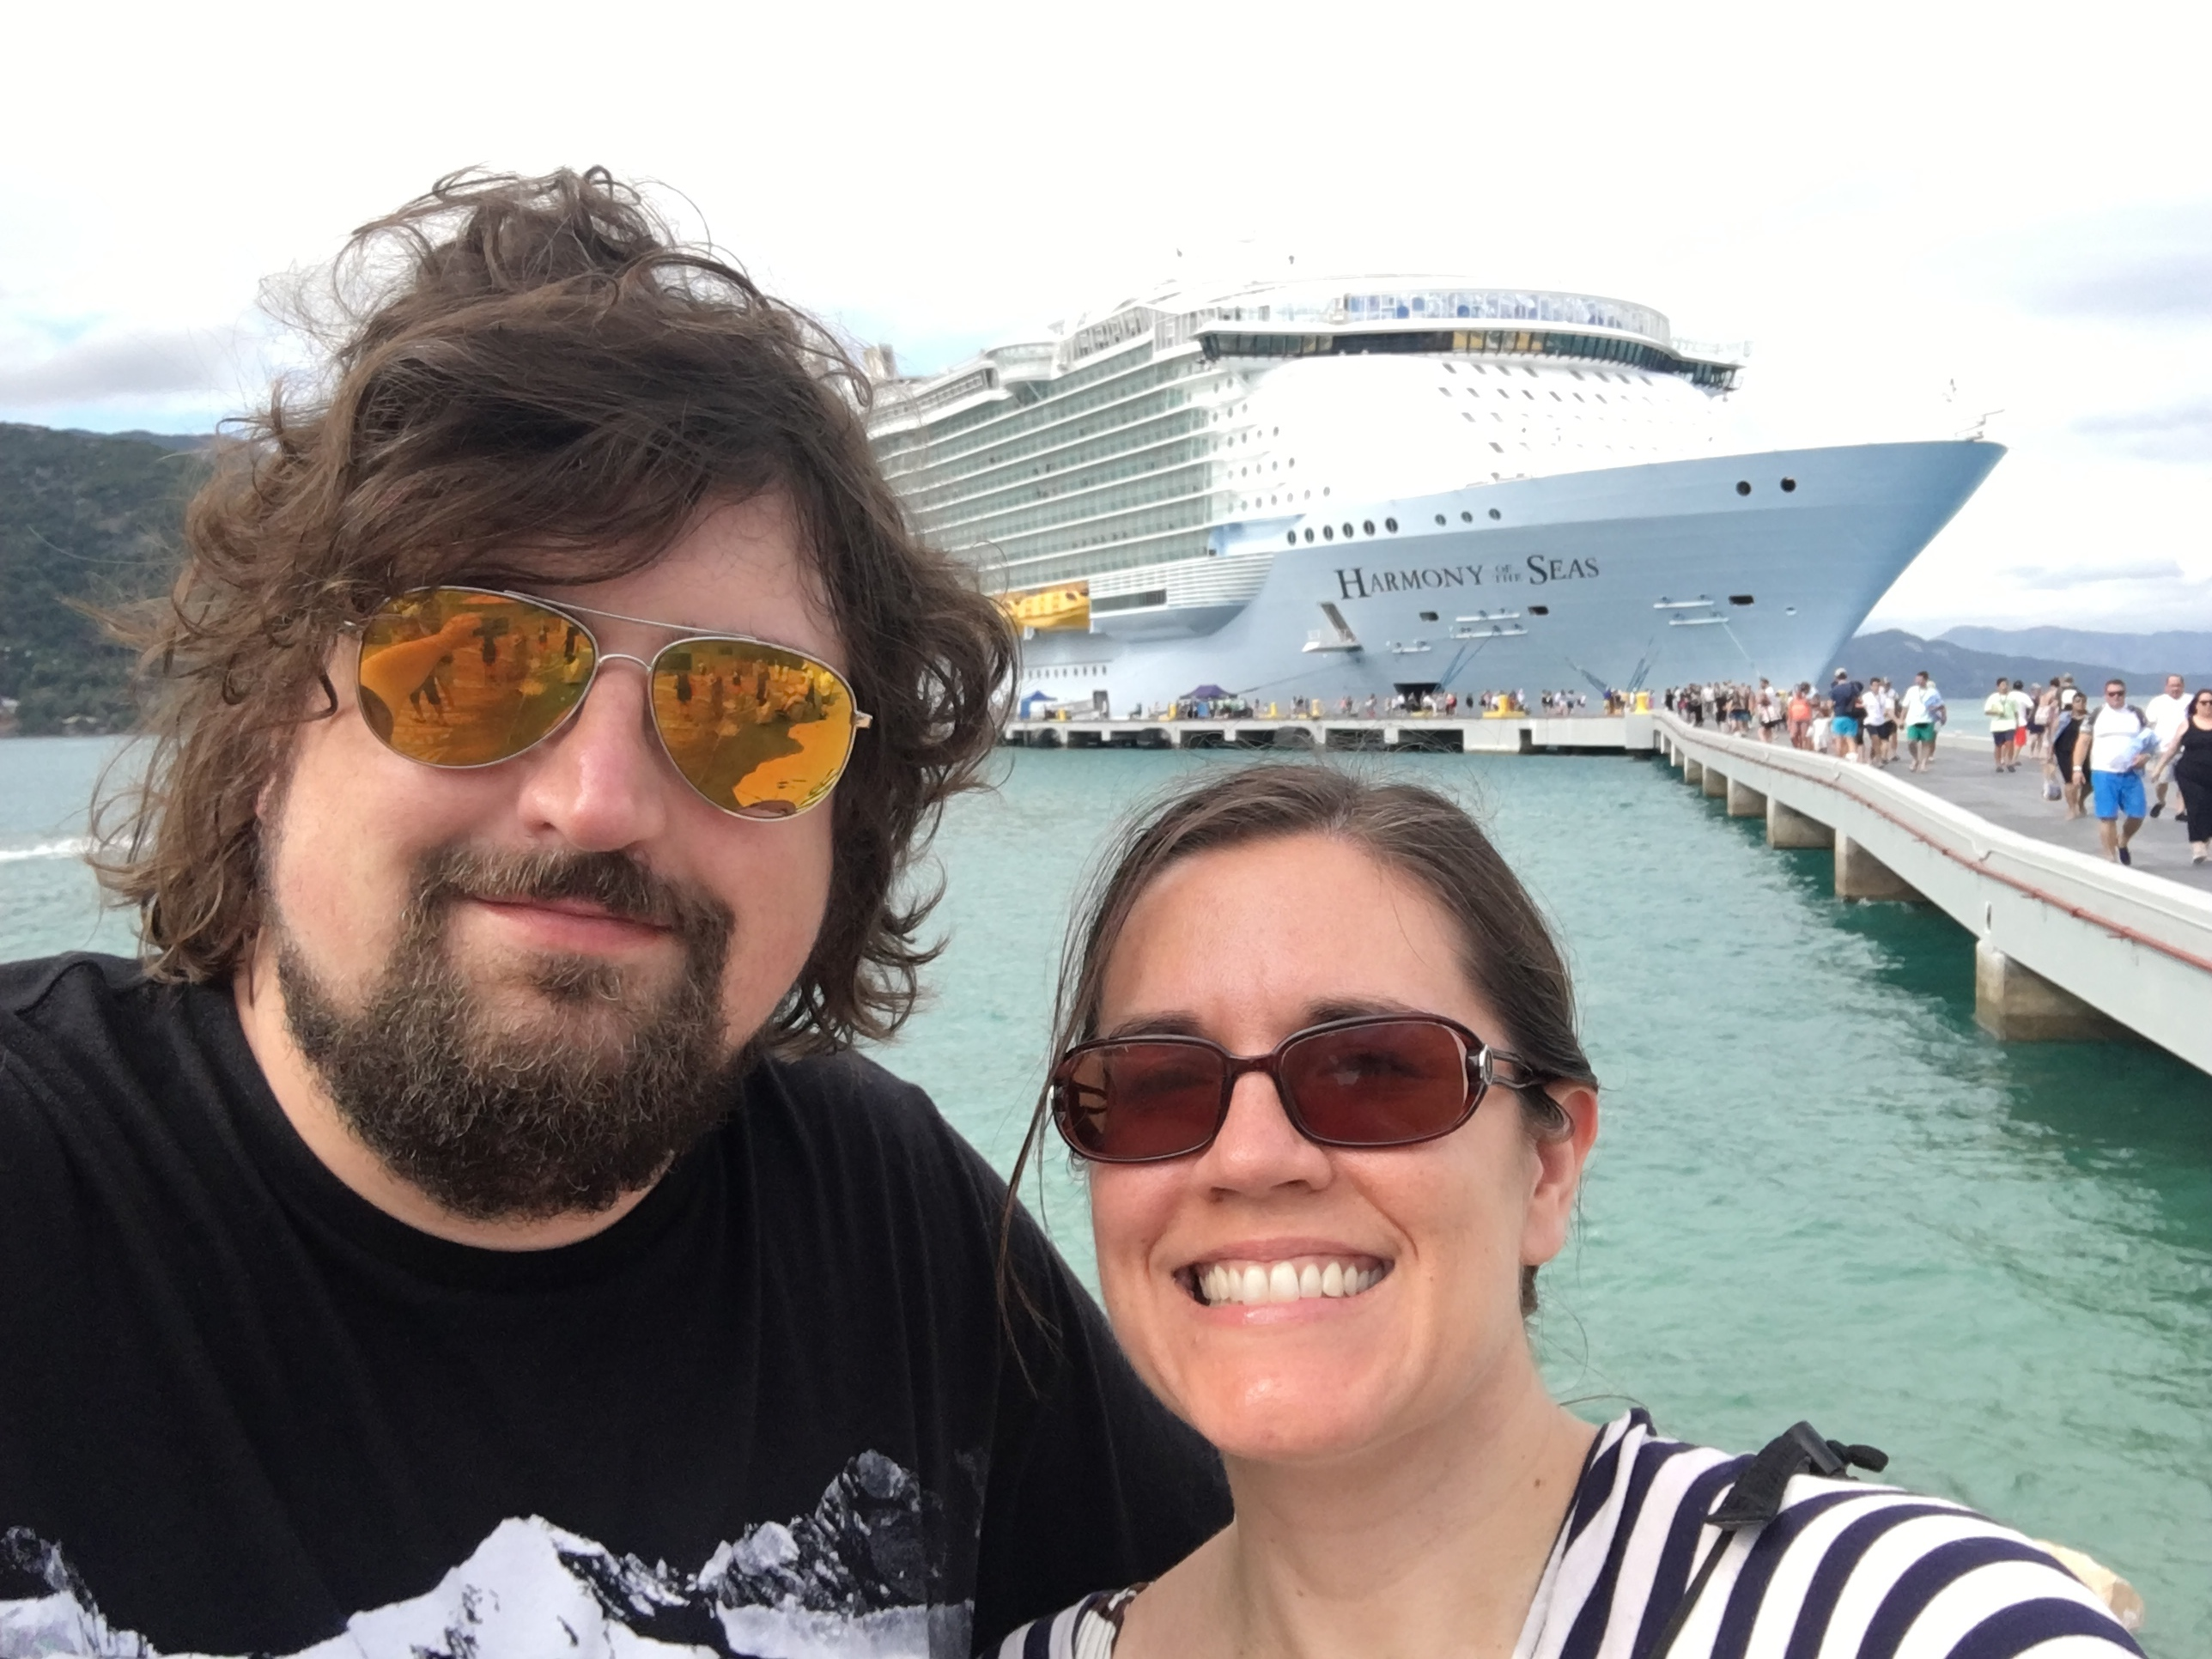 On the Royal Caribbean Harmony of the Seas